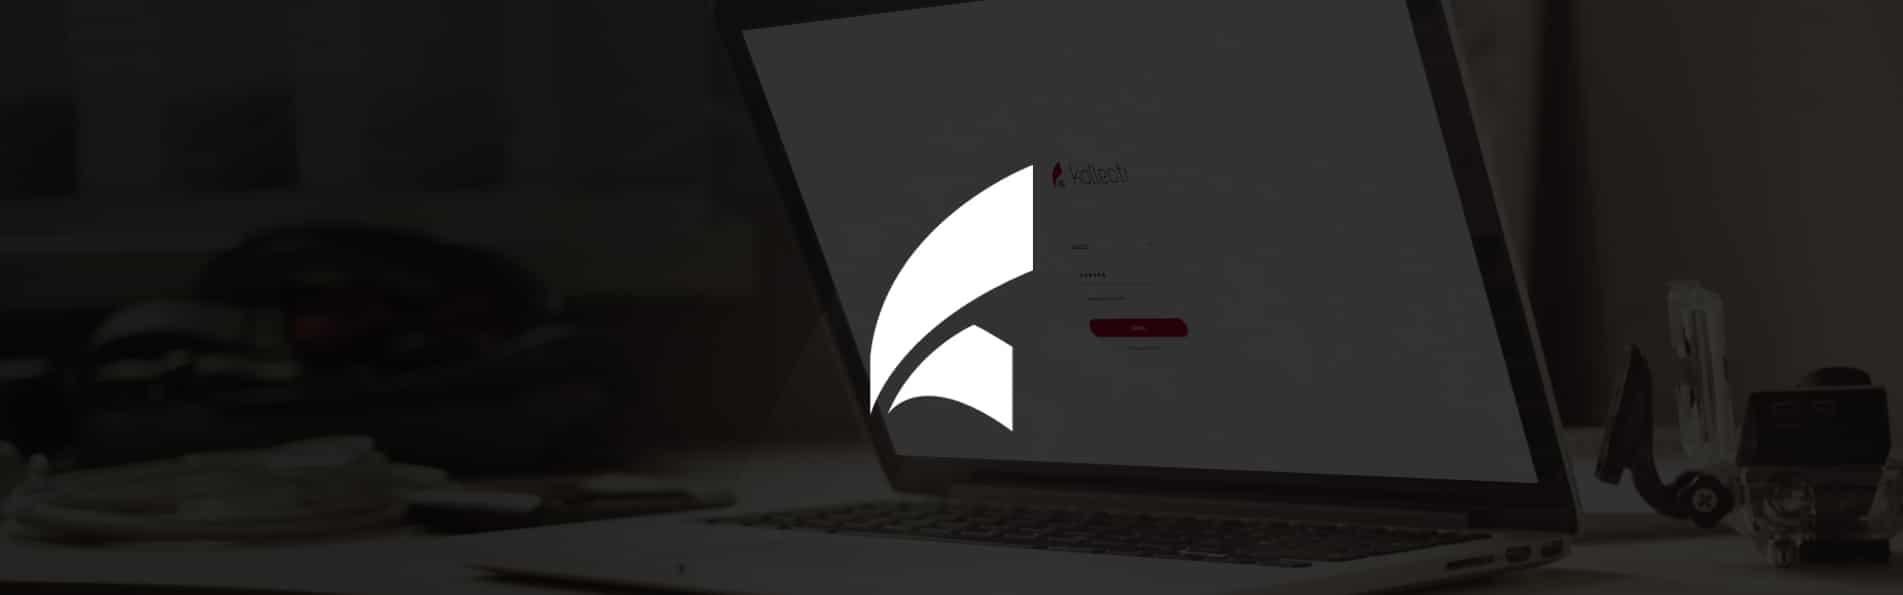 branding-webdesign-kollecti-4